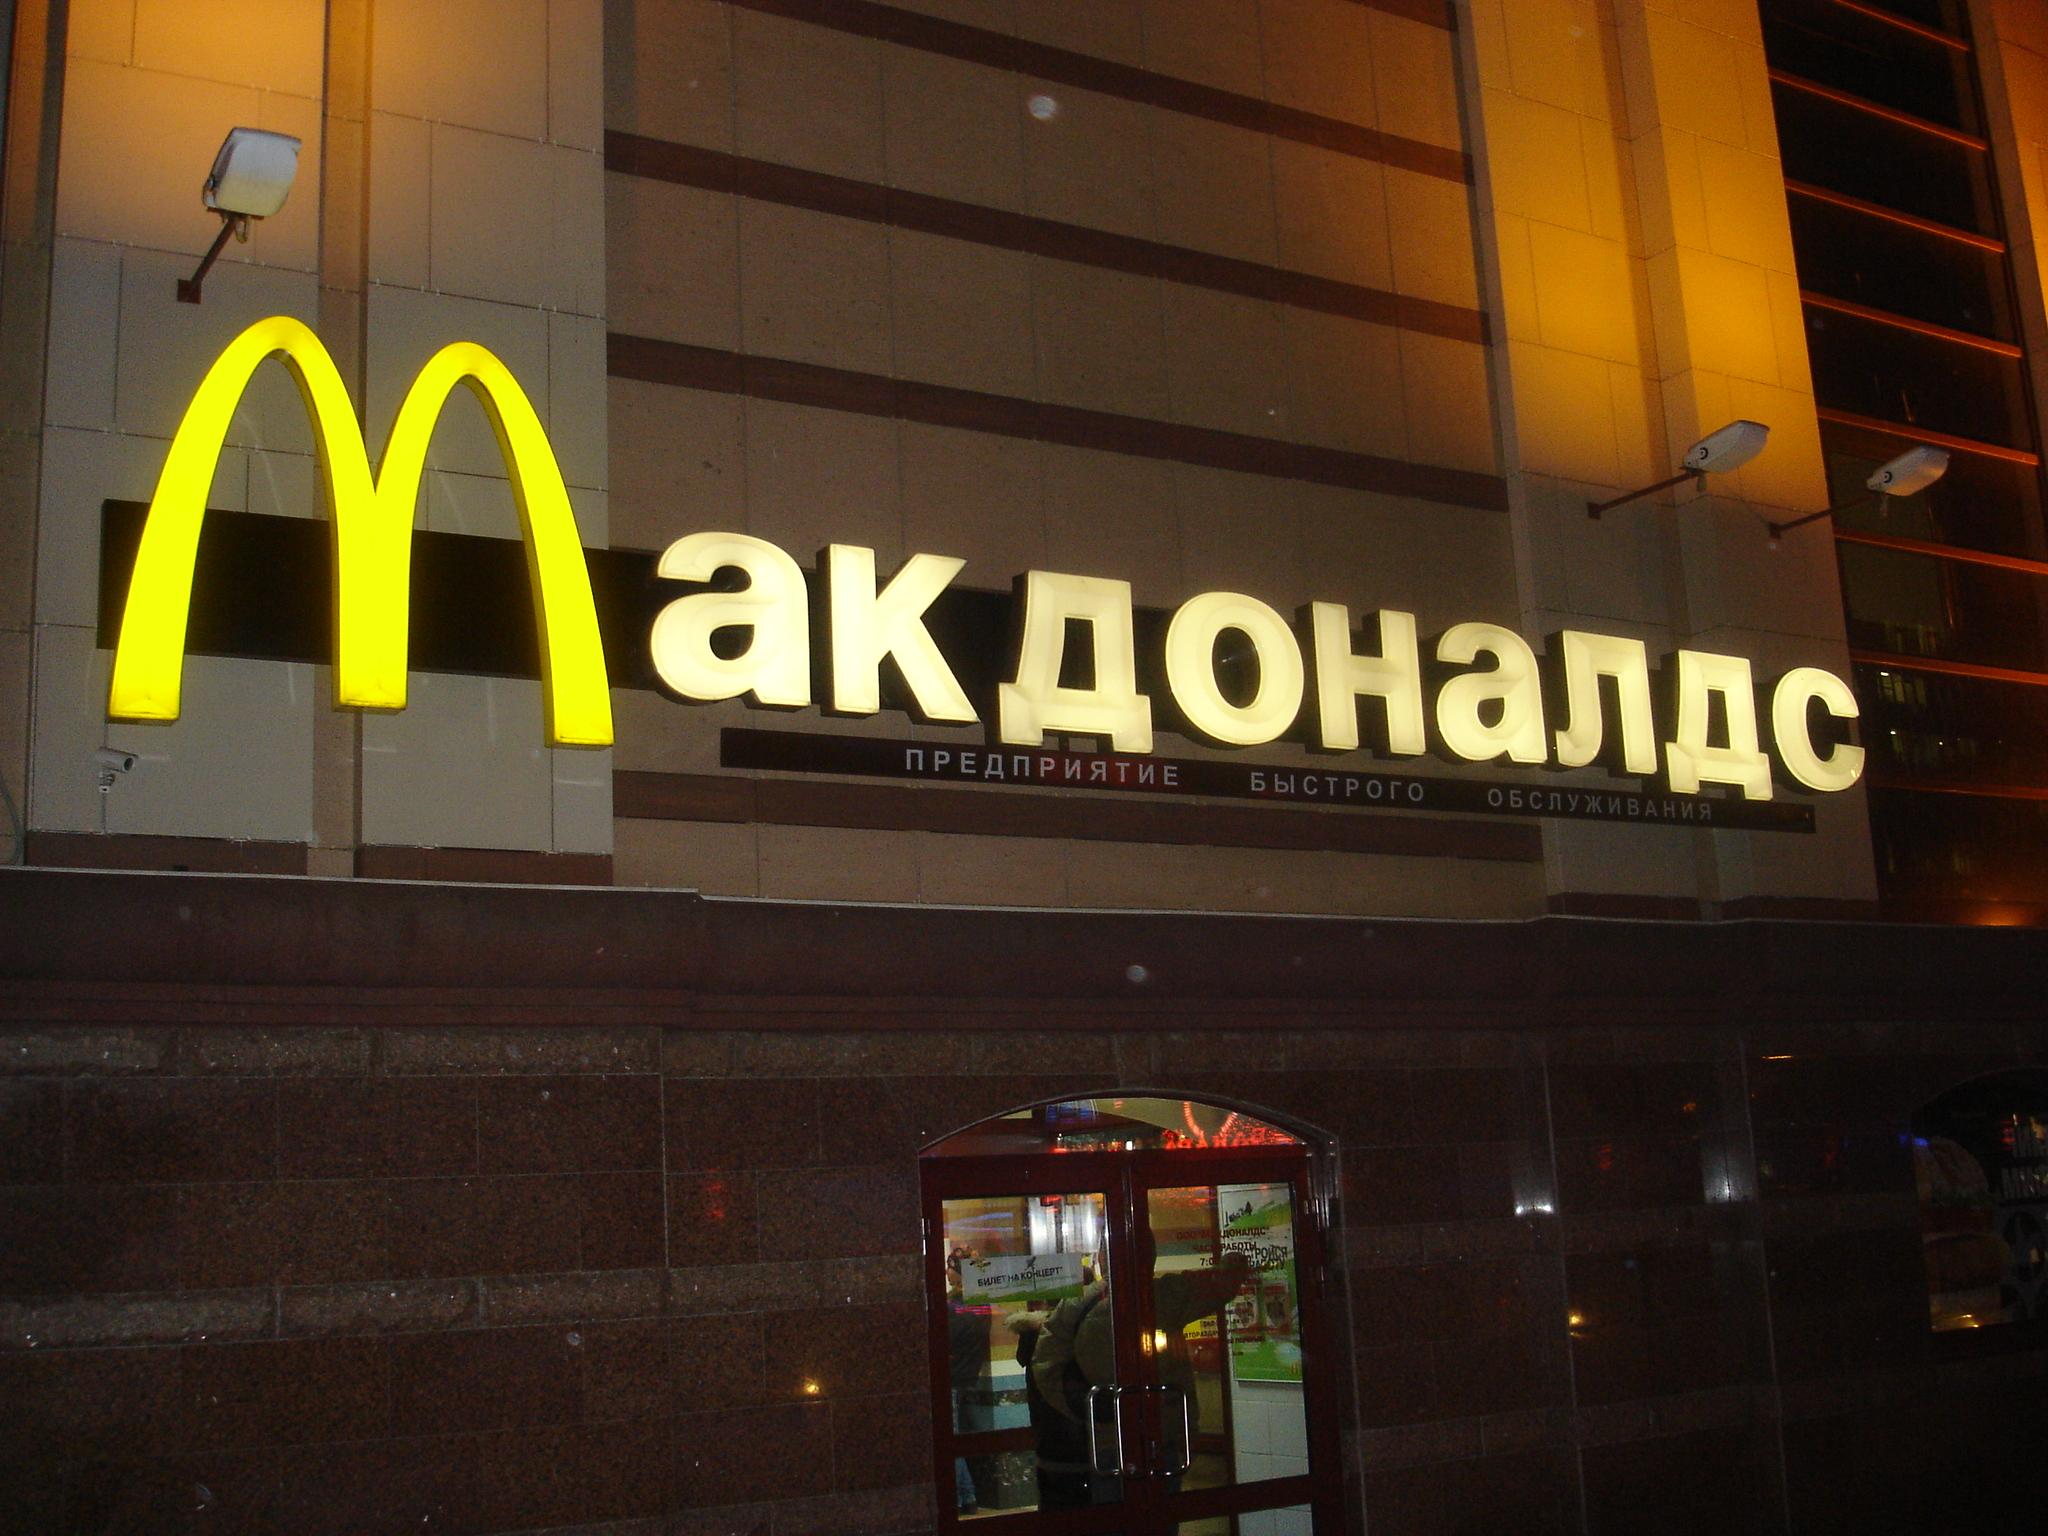 Mcdonald in russia